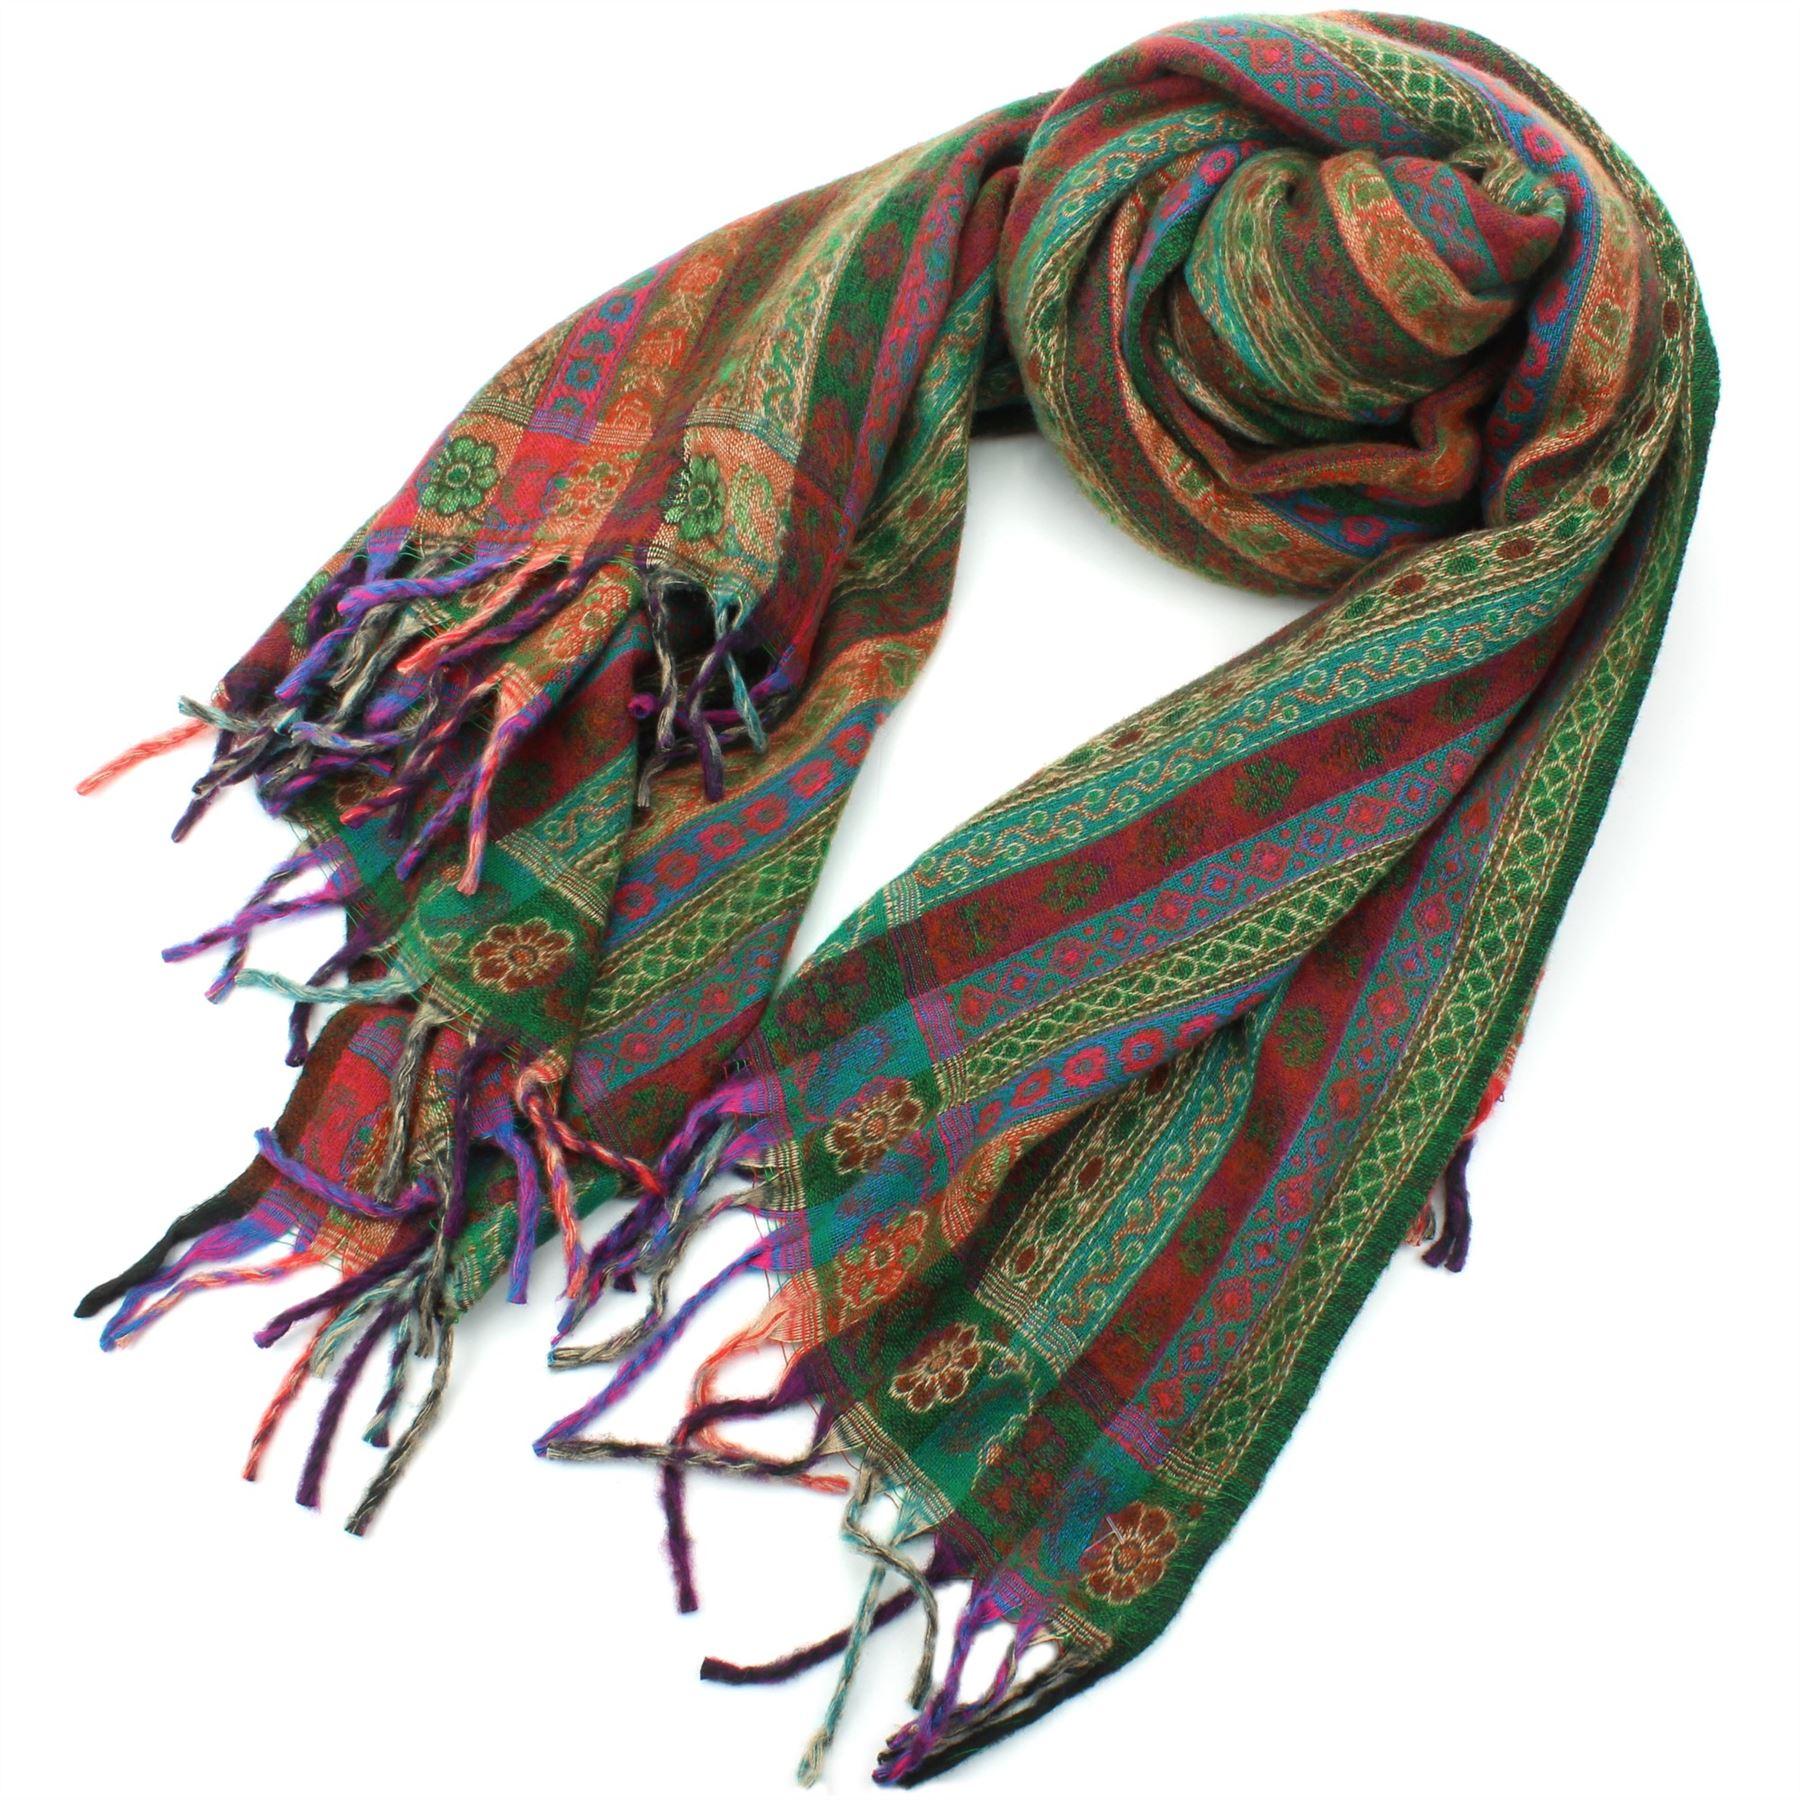 Acrylic-Wool-Blanket-Shawl-Wrap-Throw-Finest-Softest-India-Stripe-Paisley-Travel thumbnail 13